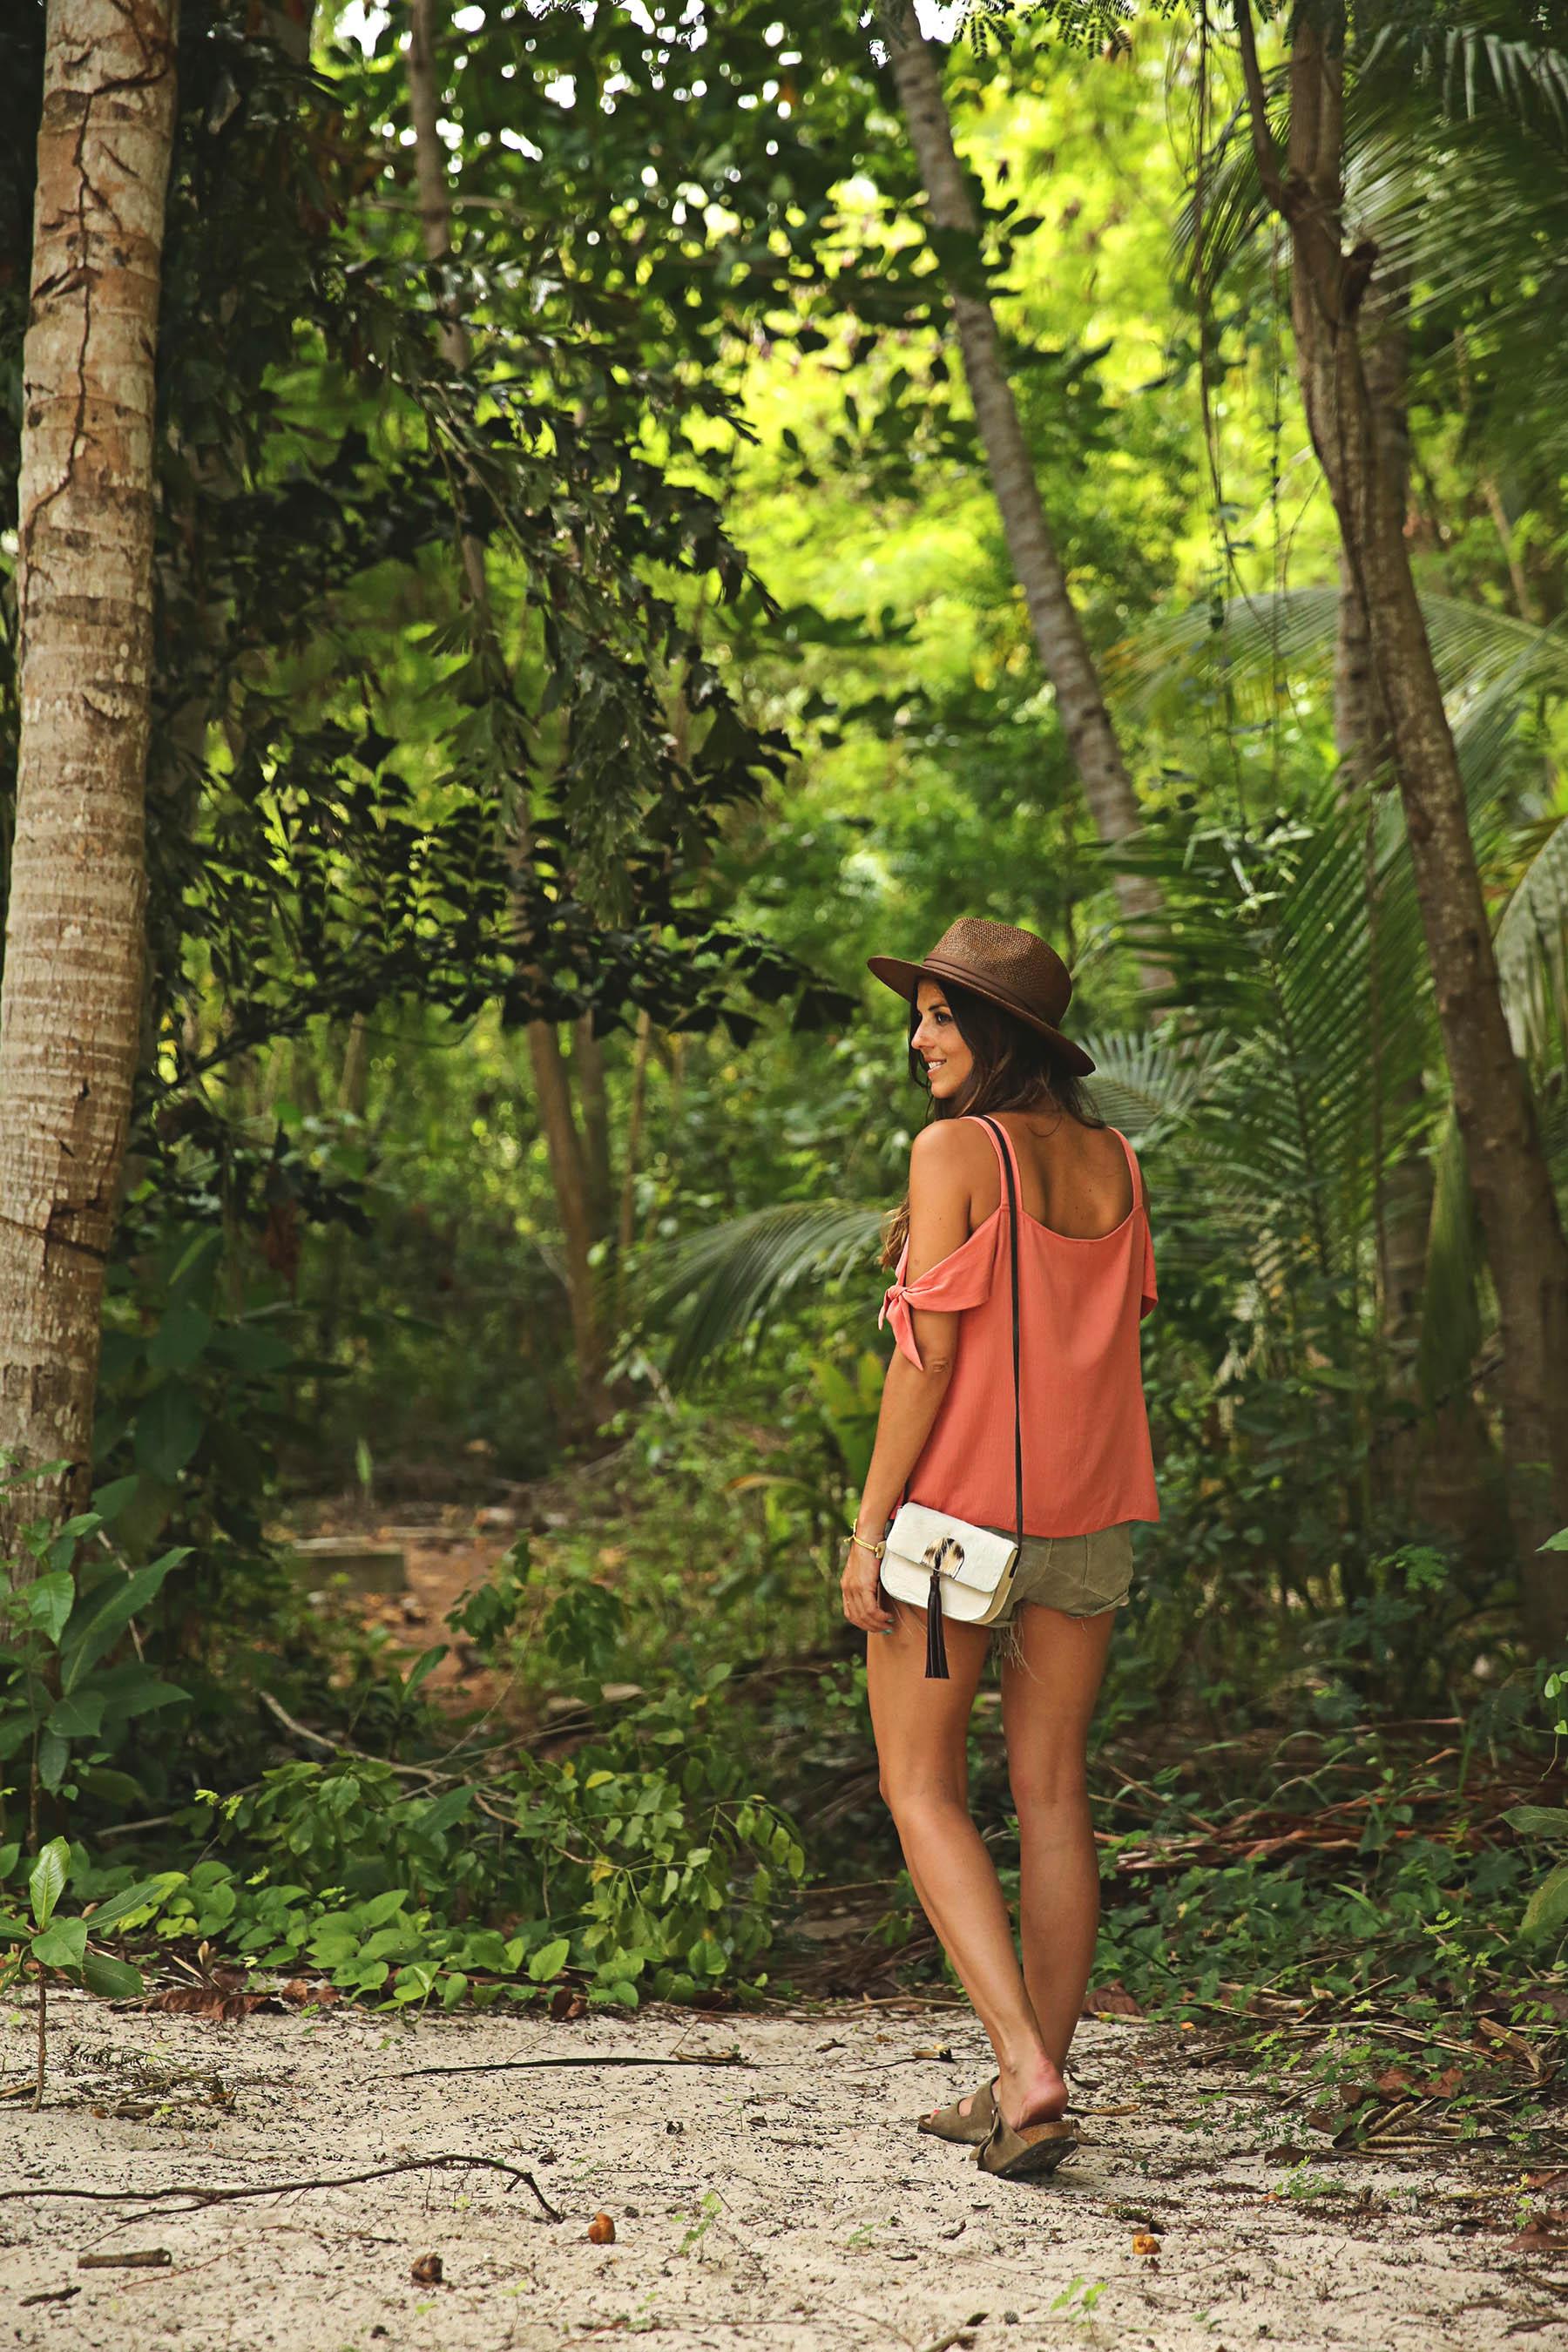 trendy-taste-look-outfit-street-style-ootd-blog-blogger-fashion-spain-moda-españa-boho-hippie-verano-birkenstock-bavaro-barcelo-khaki-caqui-shorts-sombrero-top-12